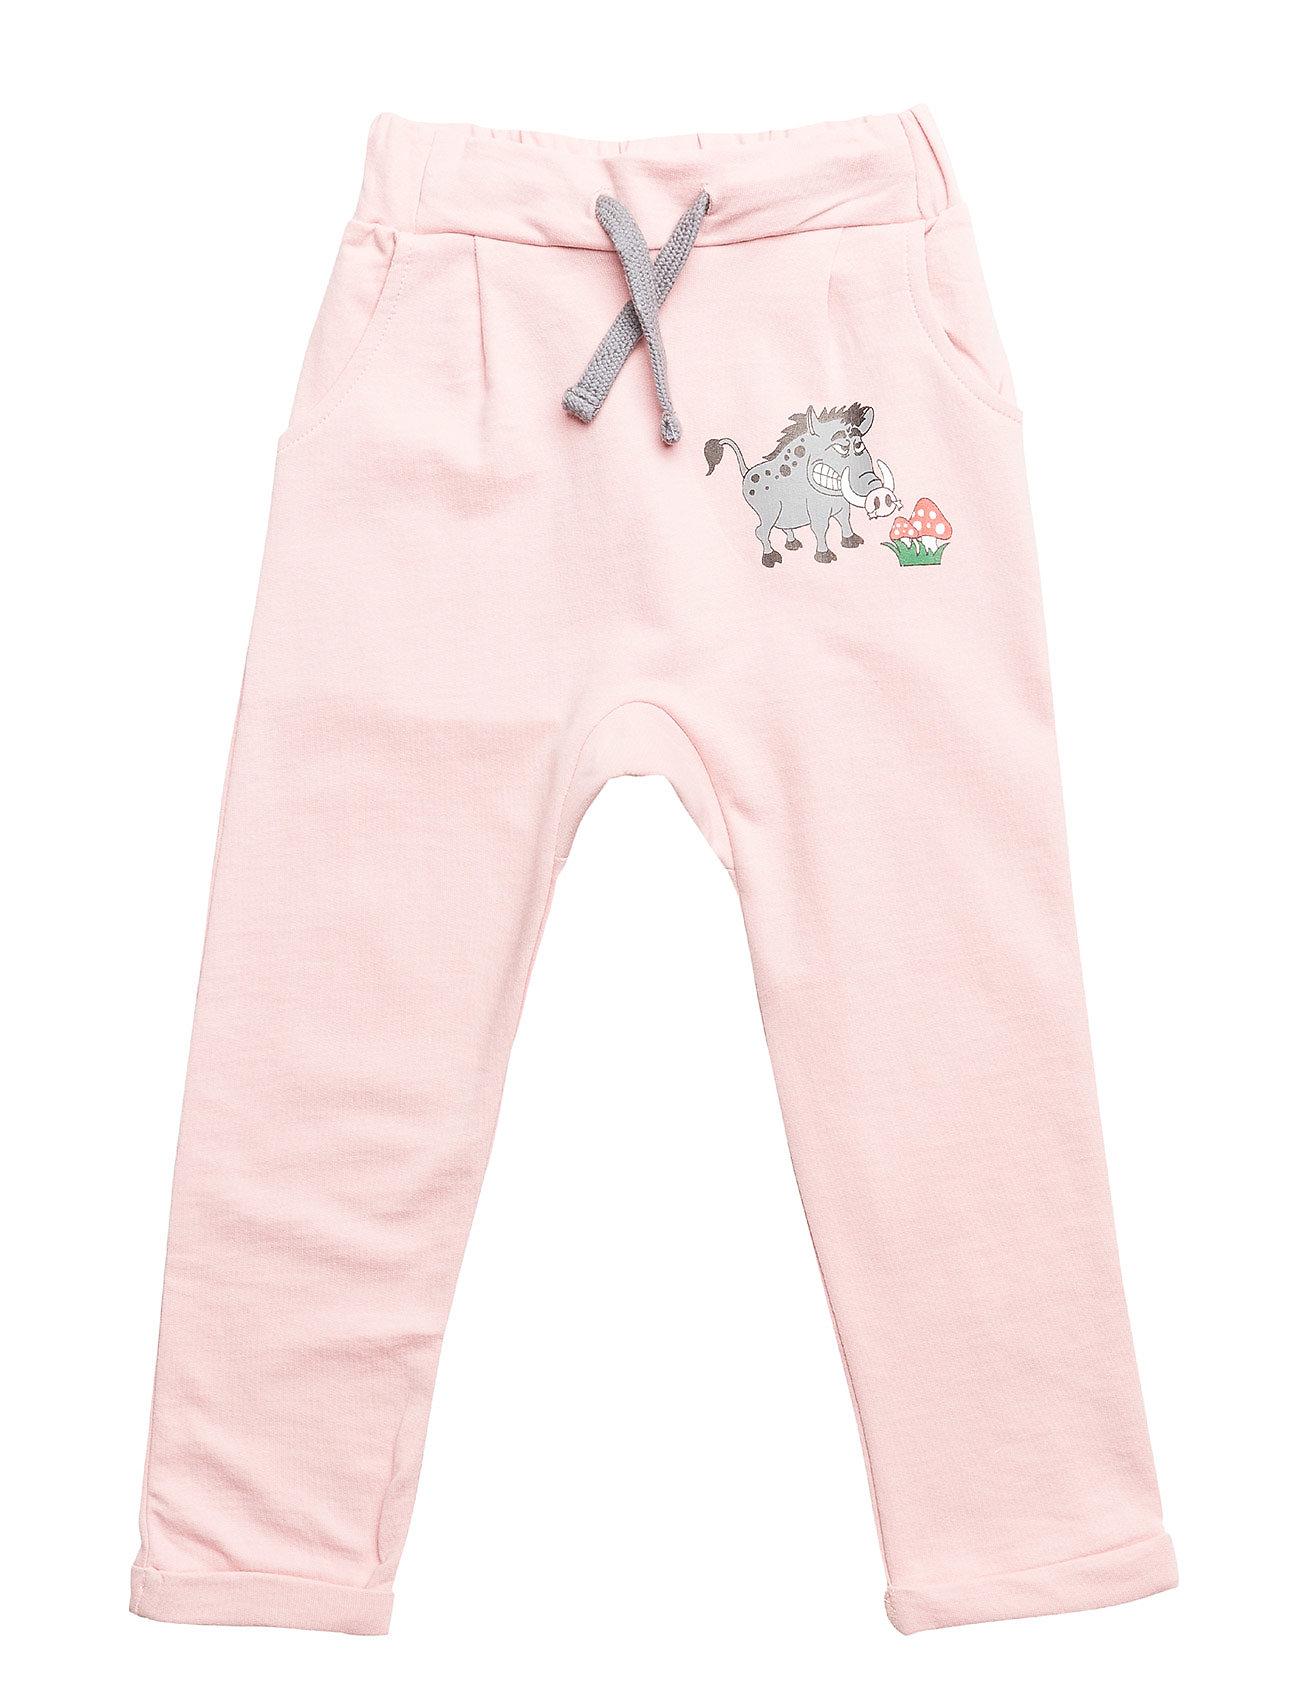 Sweatpants Vildsvinet Pink 1750 Tao Friends Booztcom